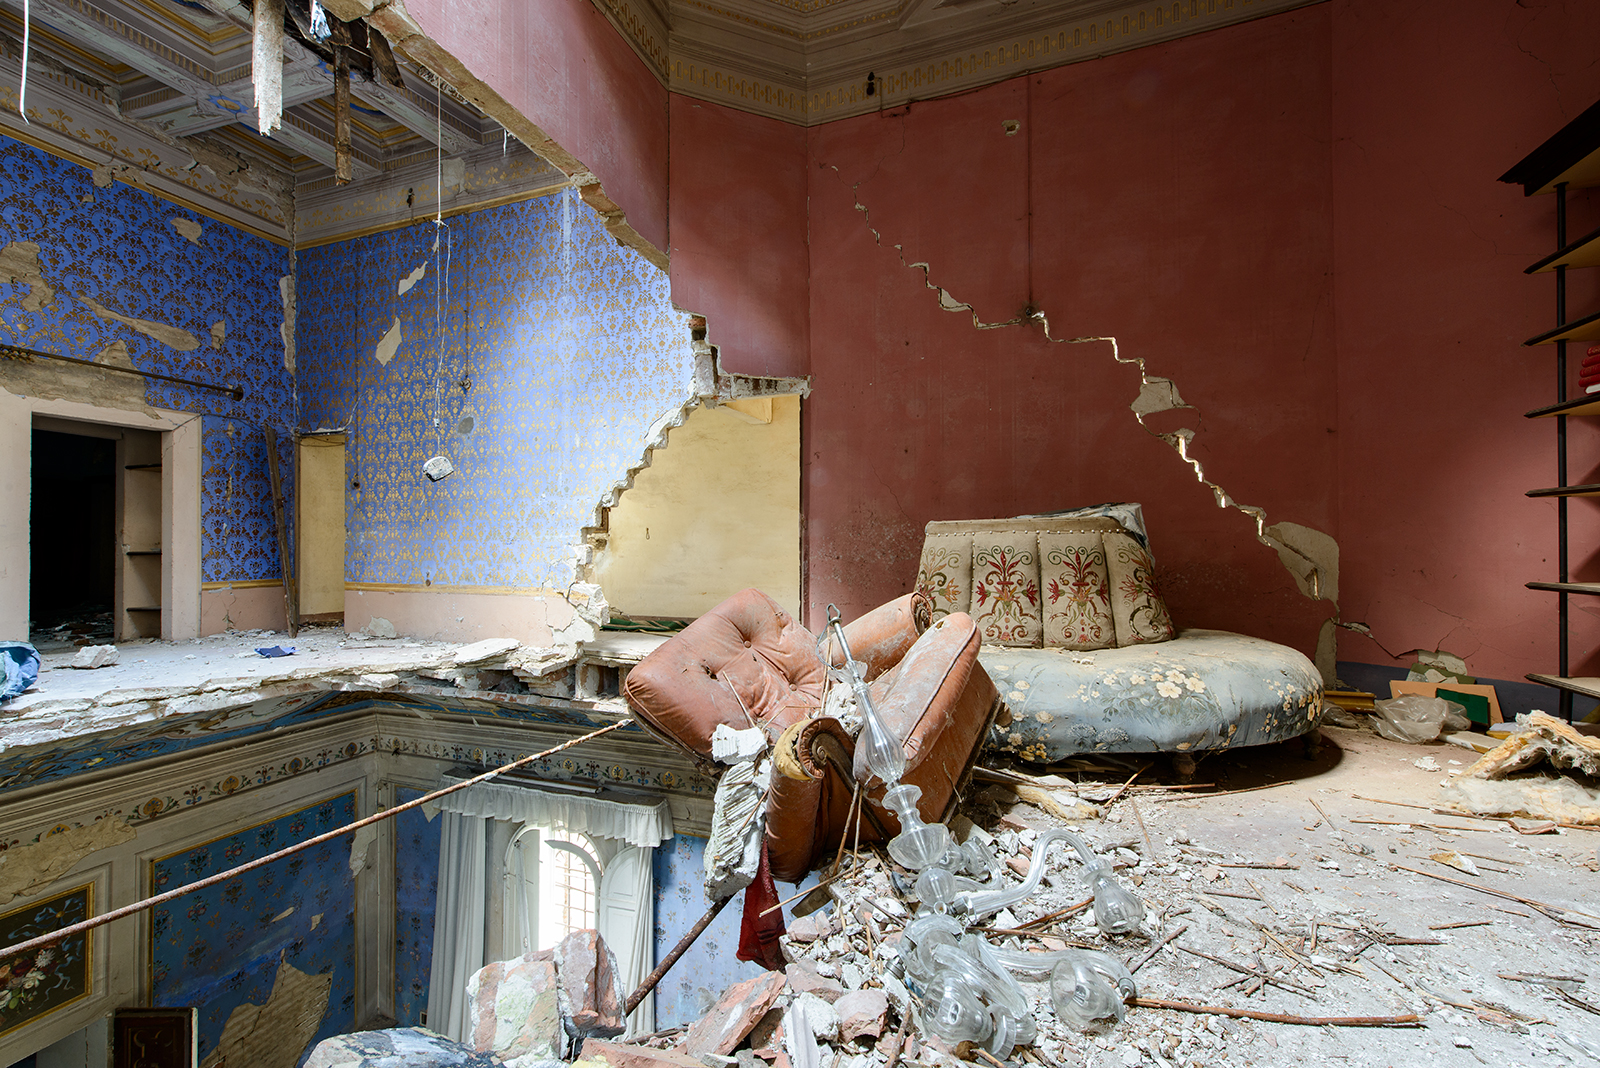 Nicola Bertellotti, The remains of the day